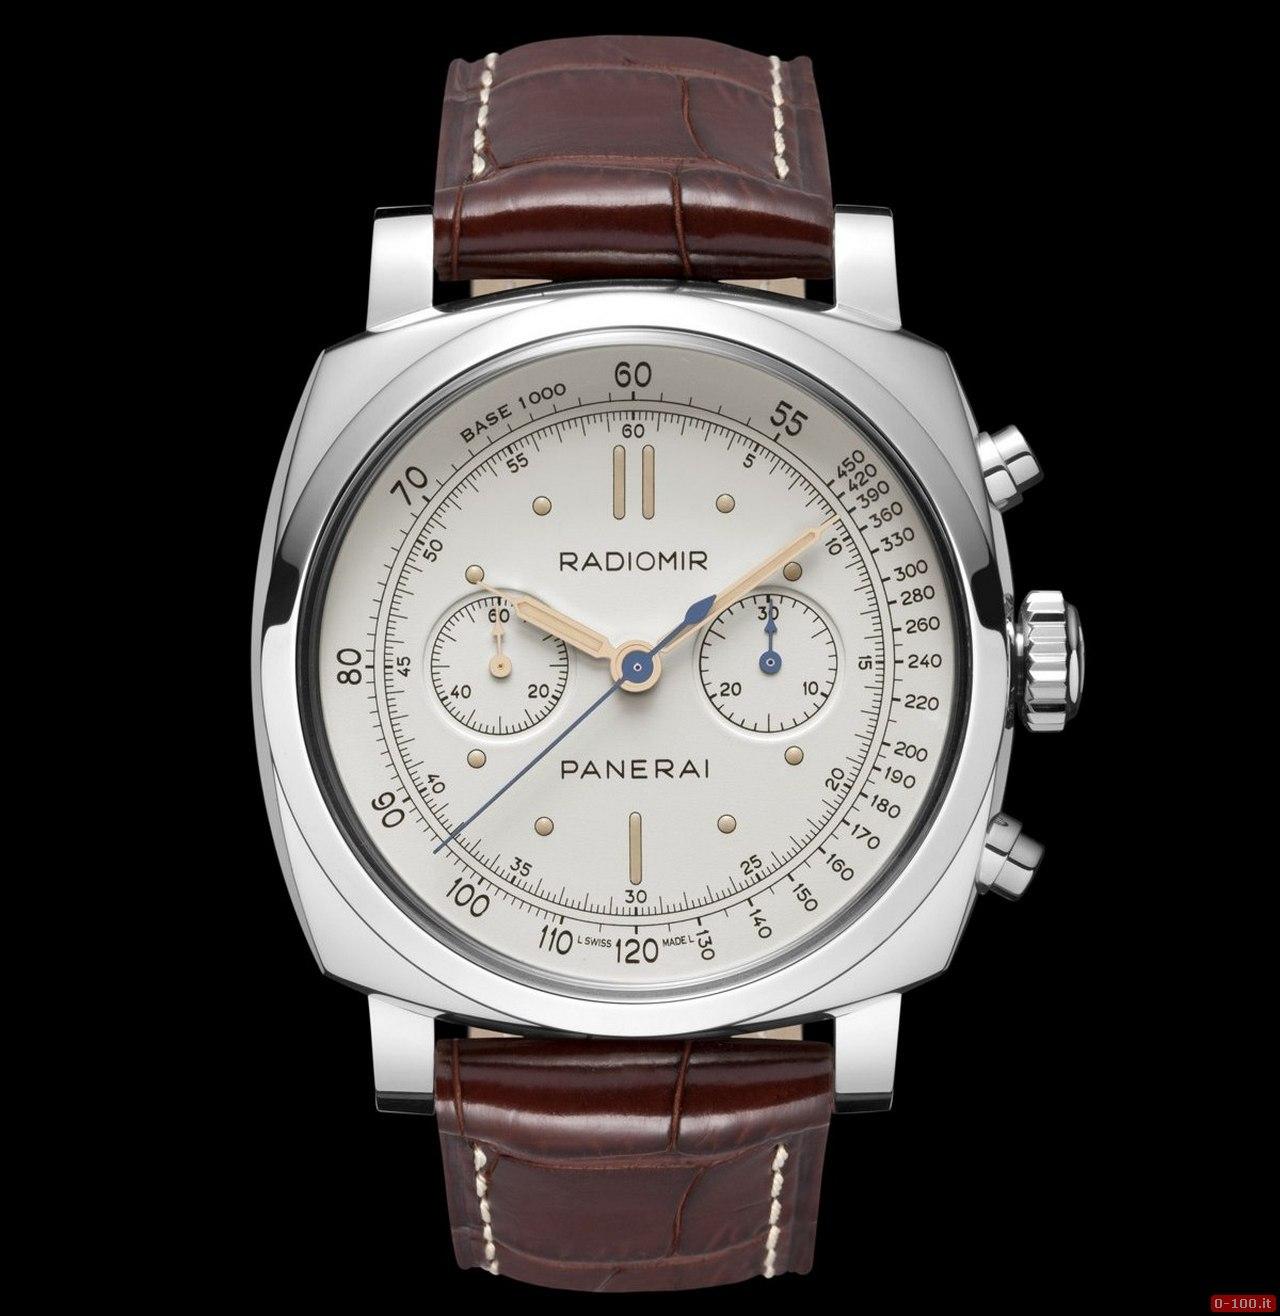 sihh-2014-panerai-radiomir-1940-chronograph-collection-limited-edition_0-100_10